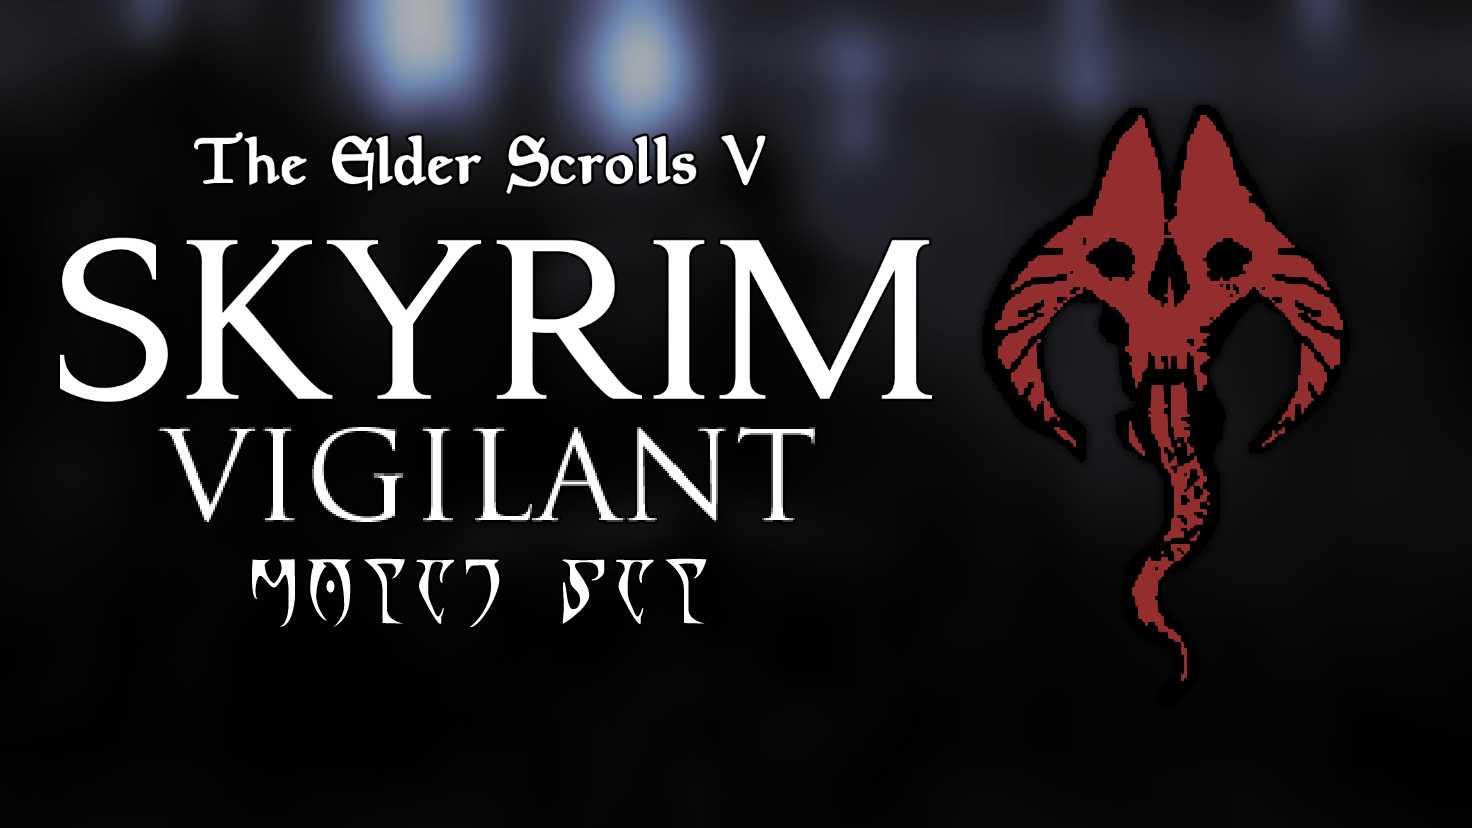 VRCMods - Daedric Prince Molag Bal [Skyrim|VIGILANT] - VRChat Avatars